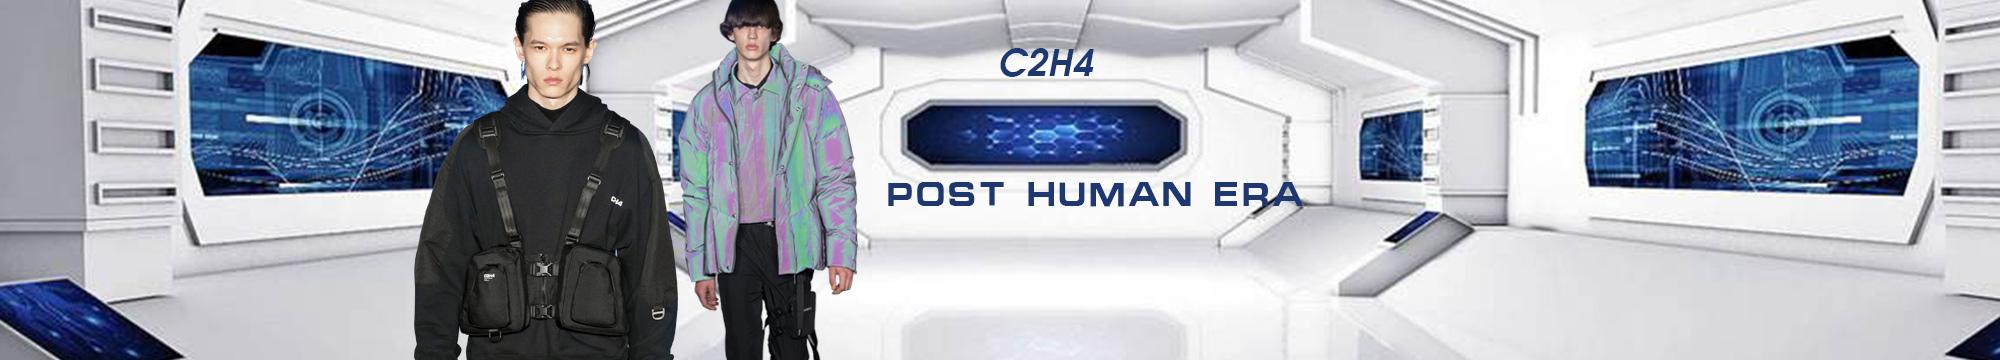 后人类时代--C2H4 Los Angeles男装T台分析